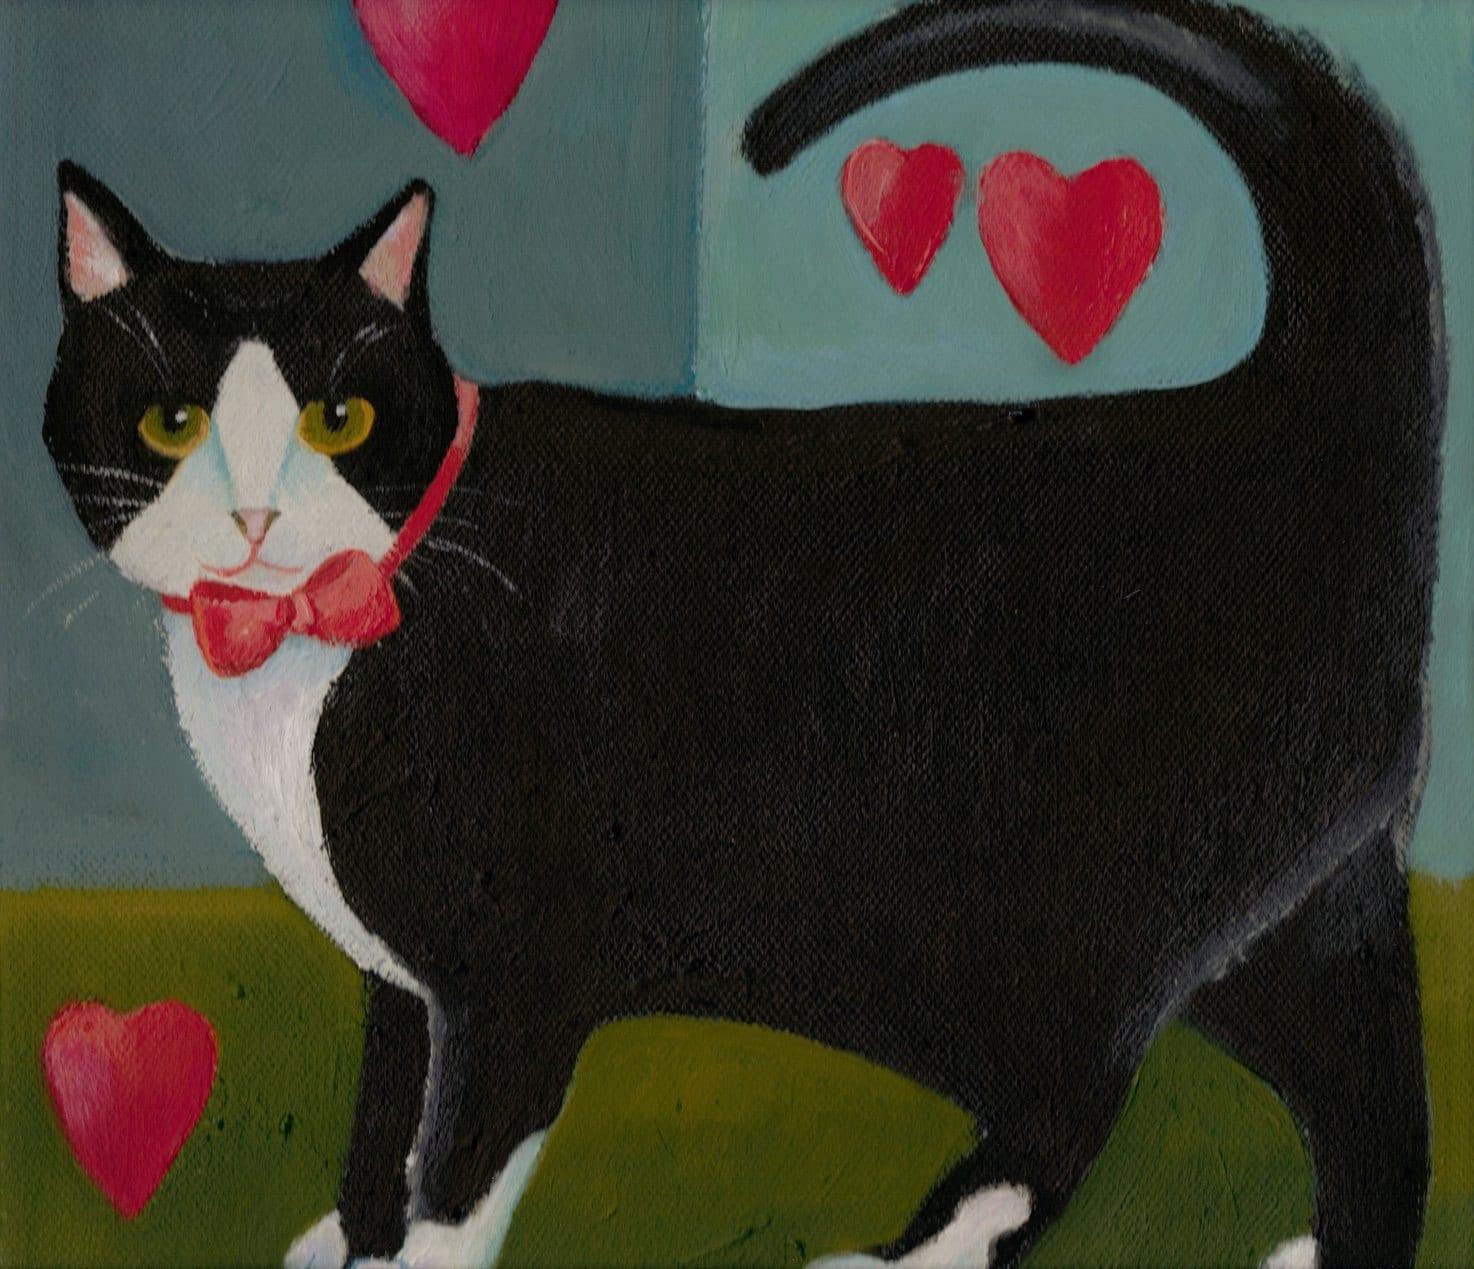 artcatsdogsbunnies on pinterest cat art